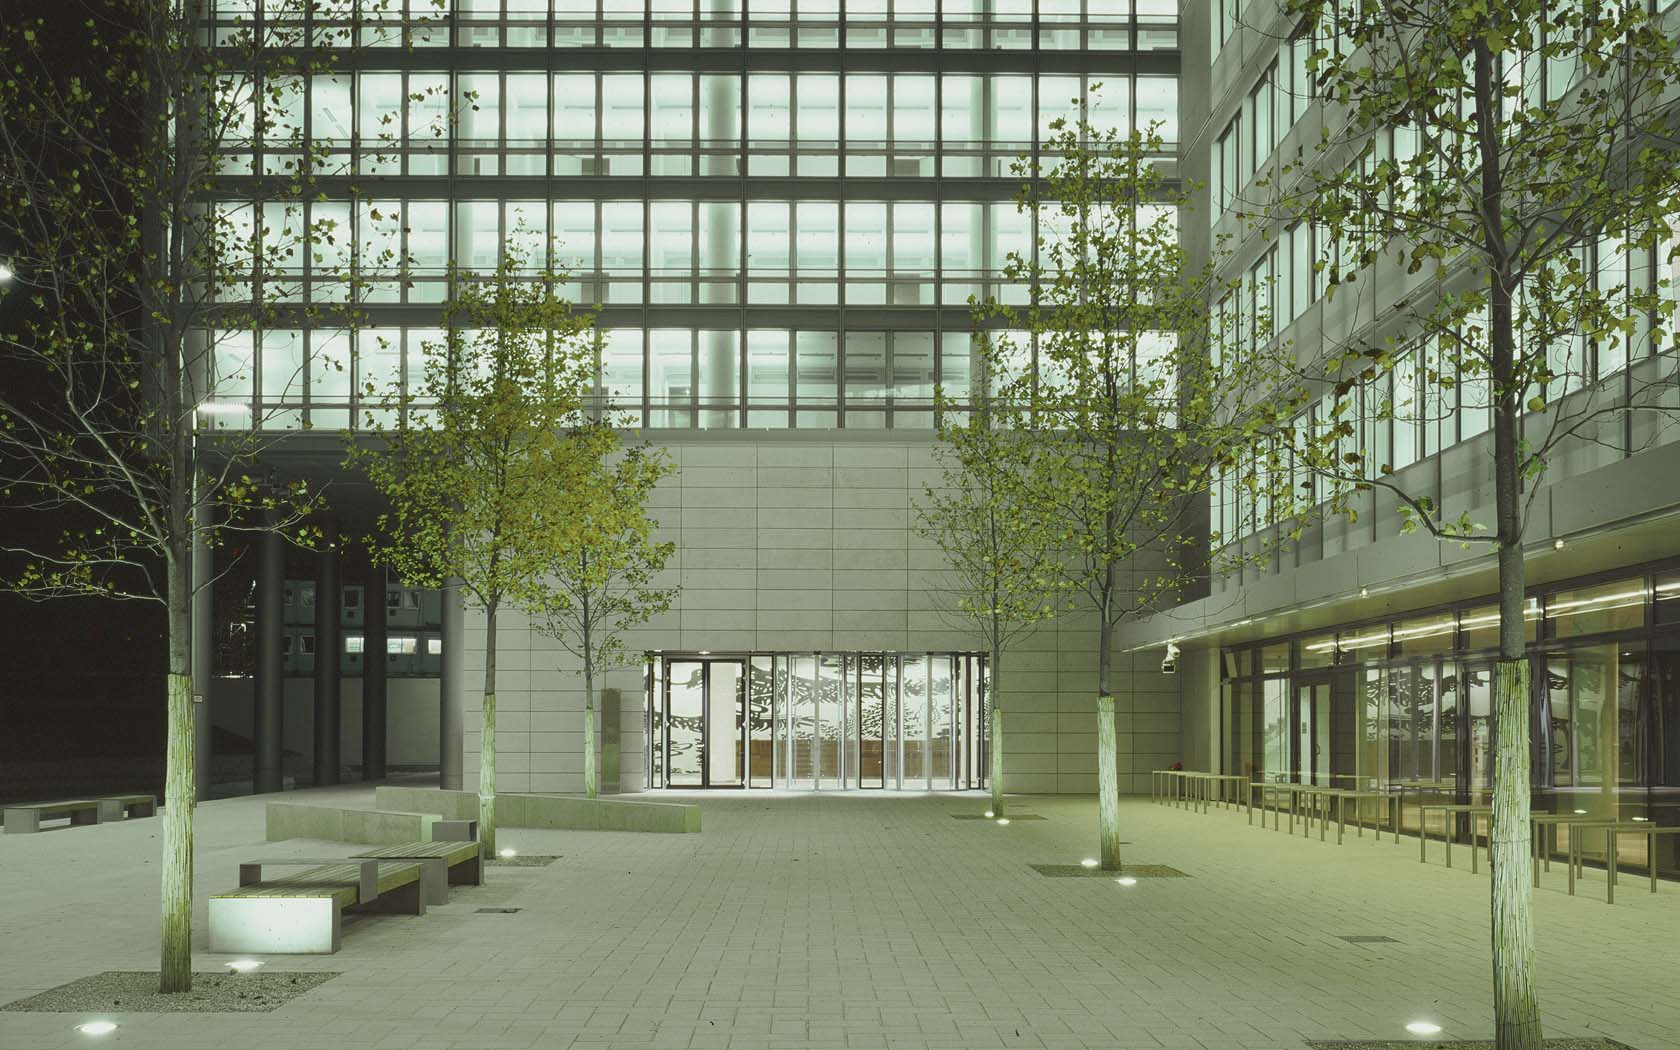 Bürogebäude am Münchner Tor 02